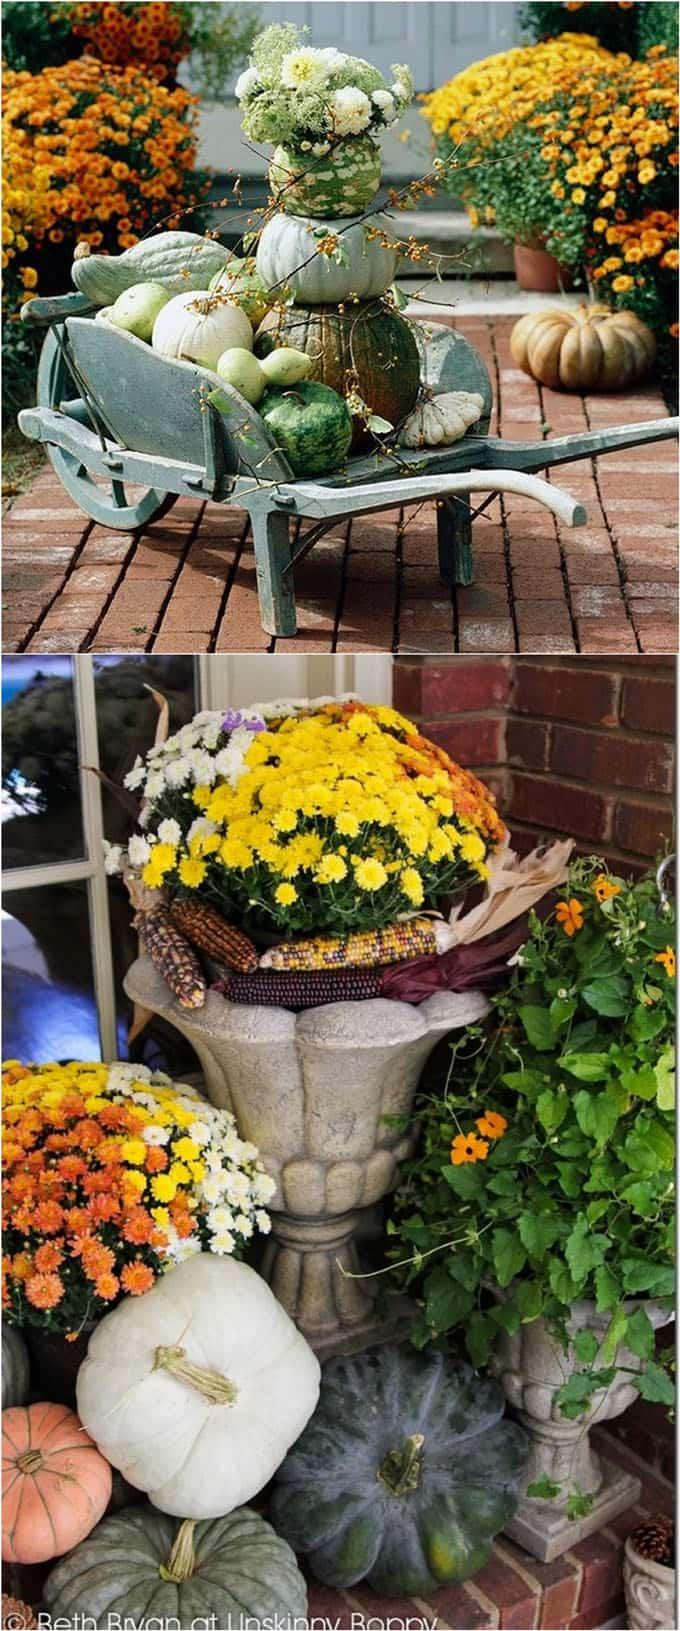 25-front-door-fall-decorations-apieceofrainbow (7)